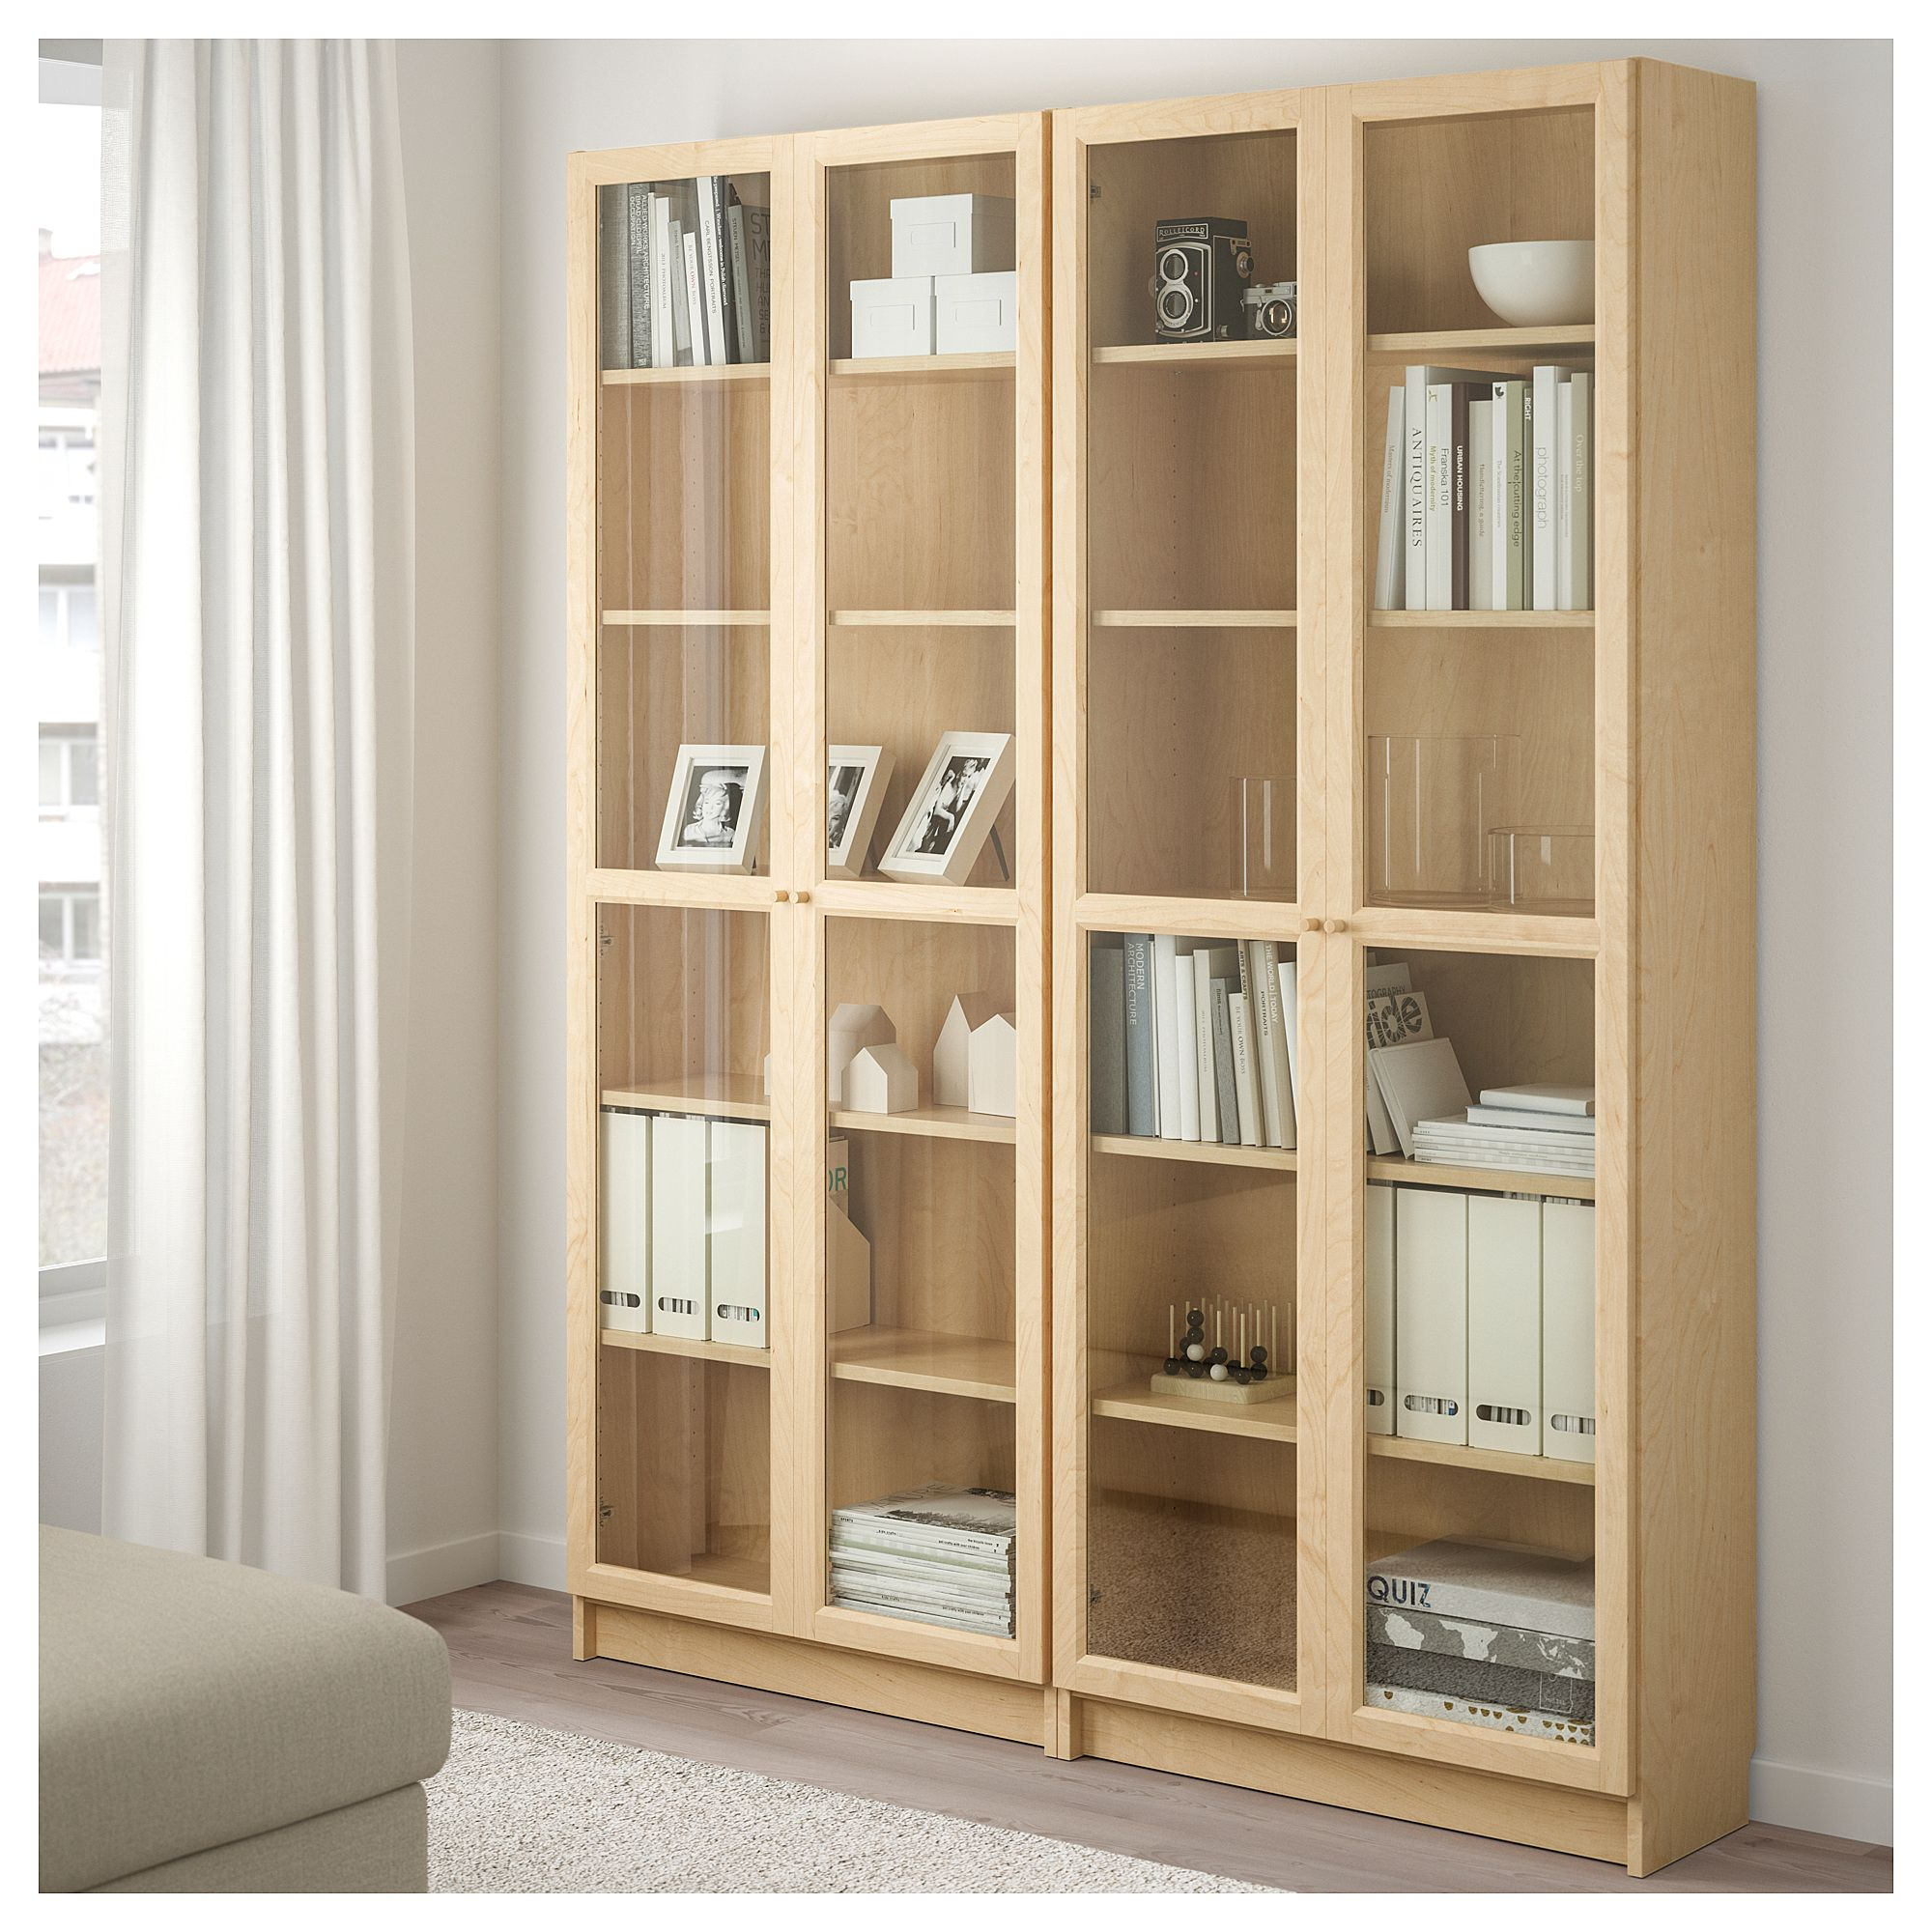 IKEA BILLY / OXBERG Bookcase birch veneer, glass